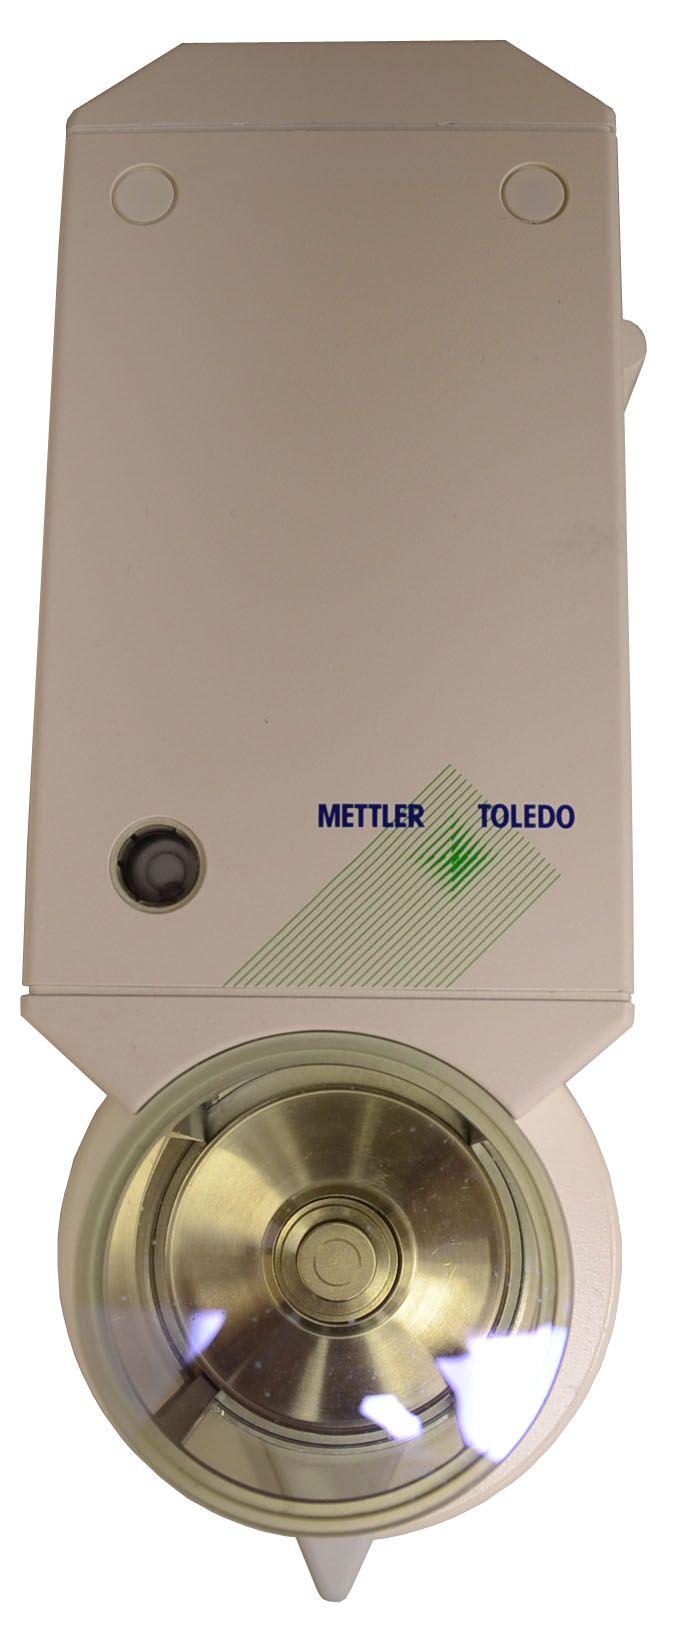 Mettler UMX2 micro balance